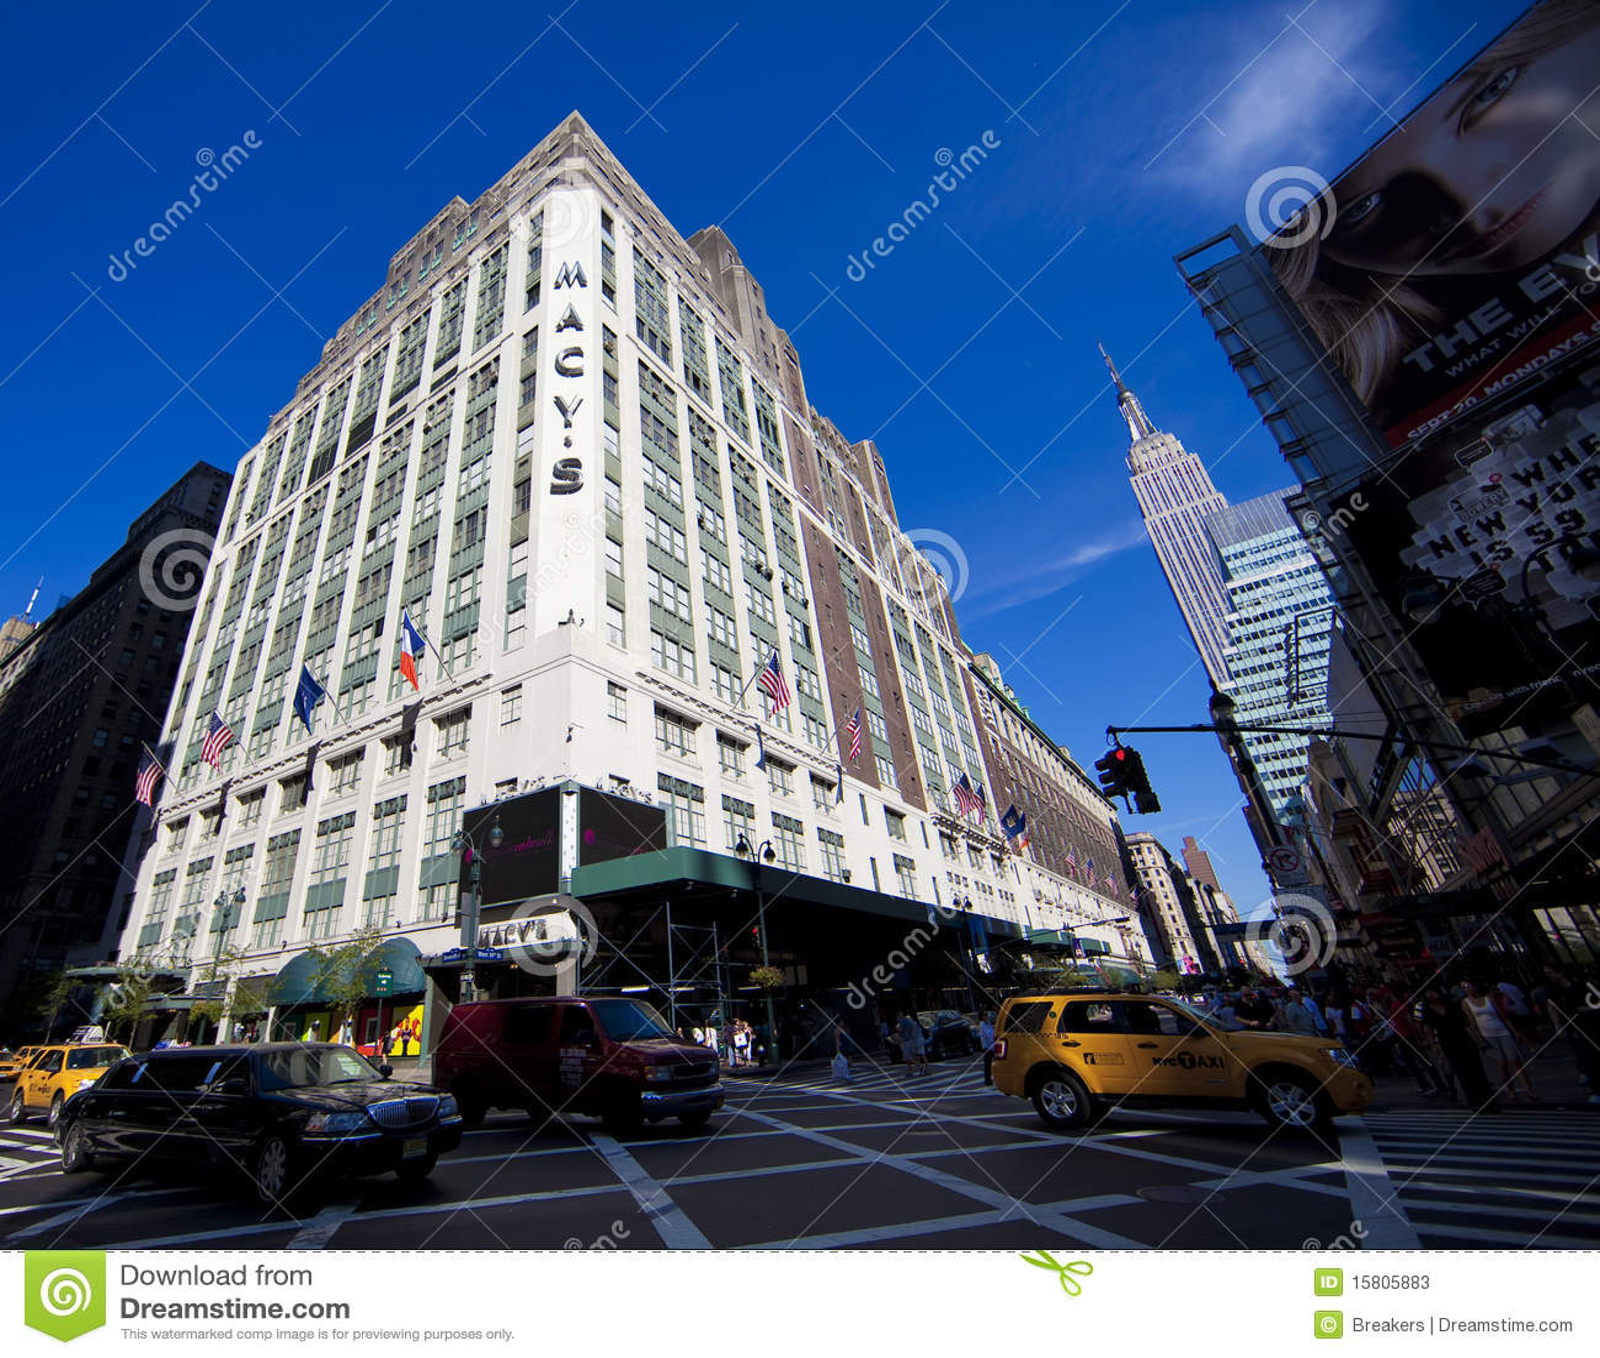 Macy's In New York City Editorial Stock Photo